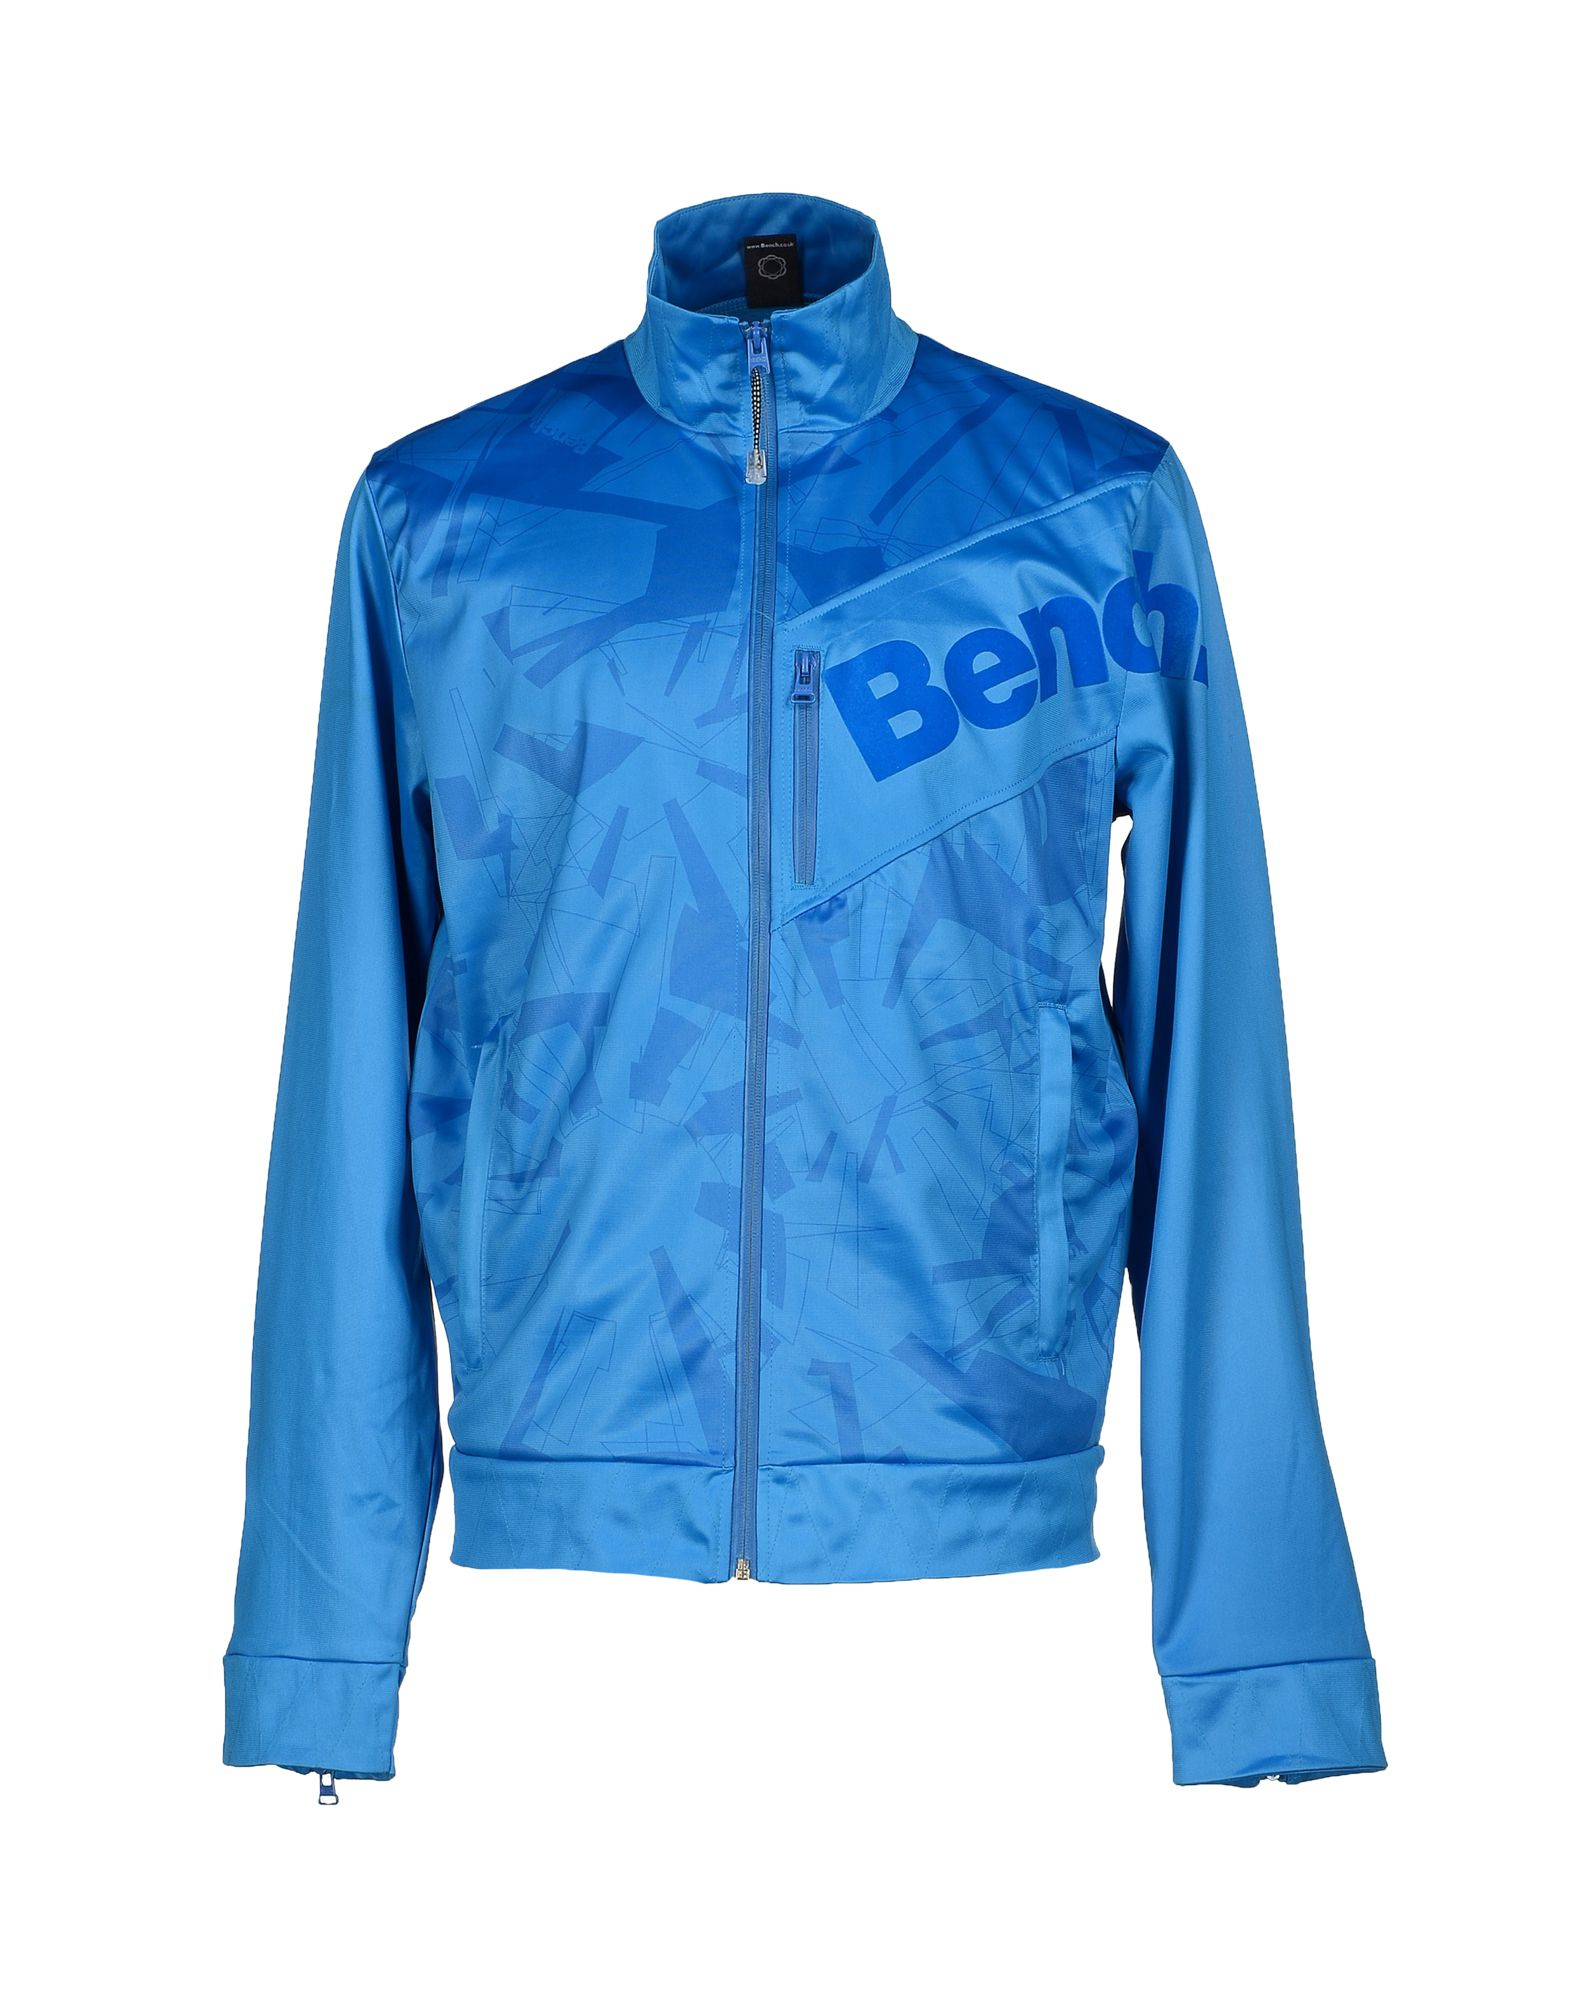 Bench Sweatshirt In Blue For Men Lyst